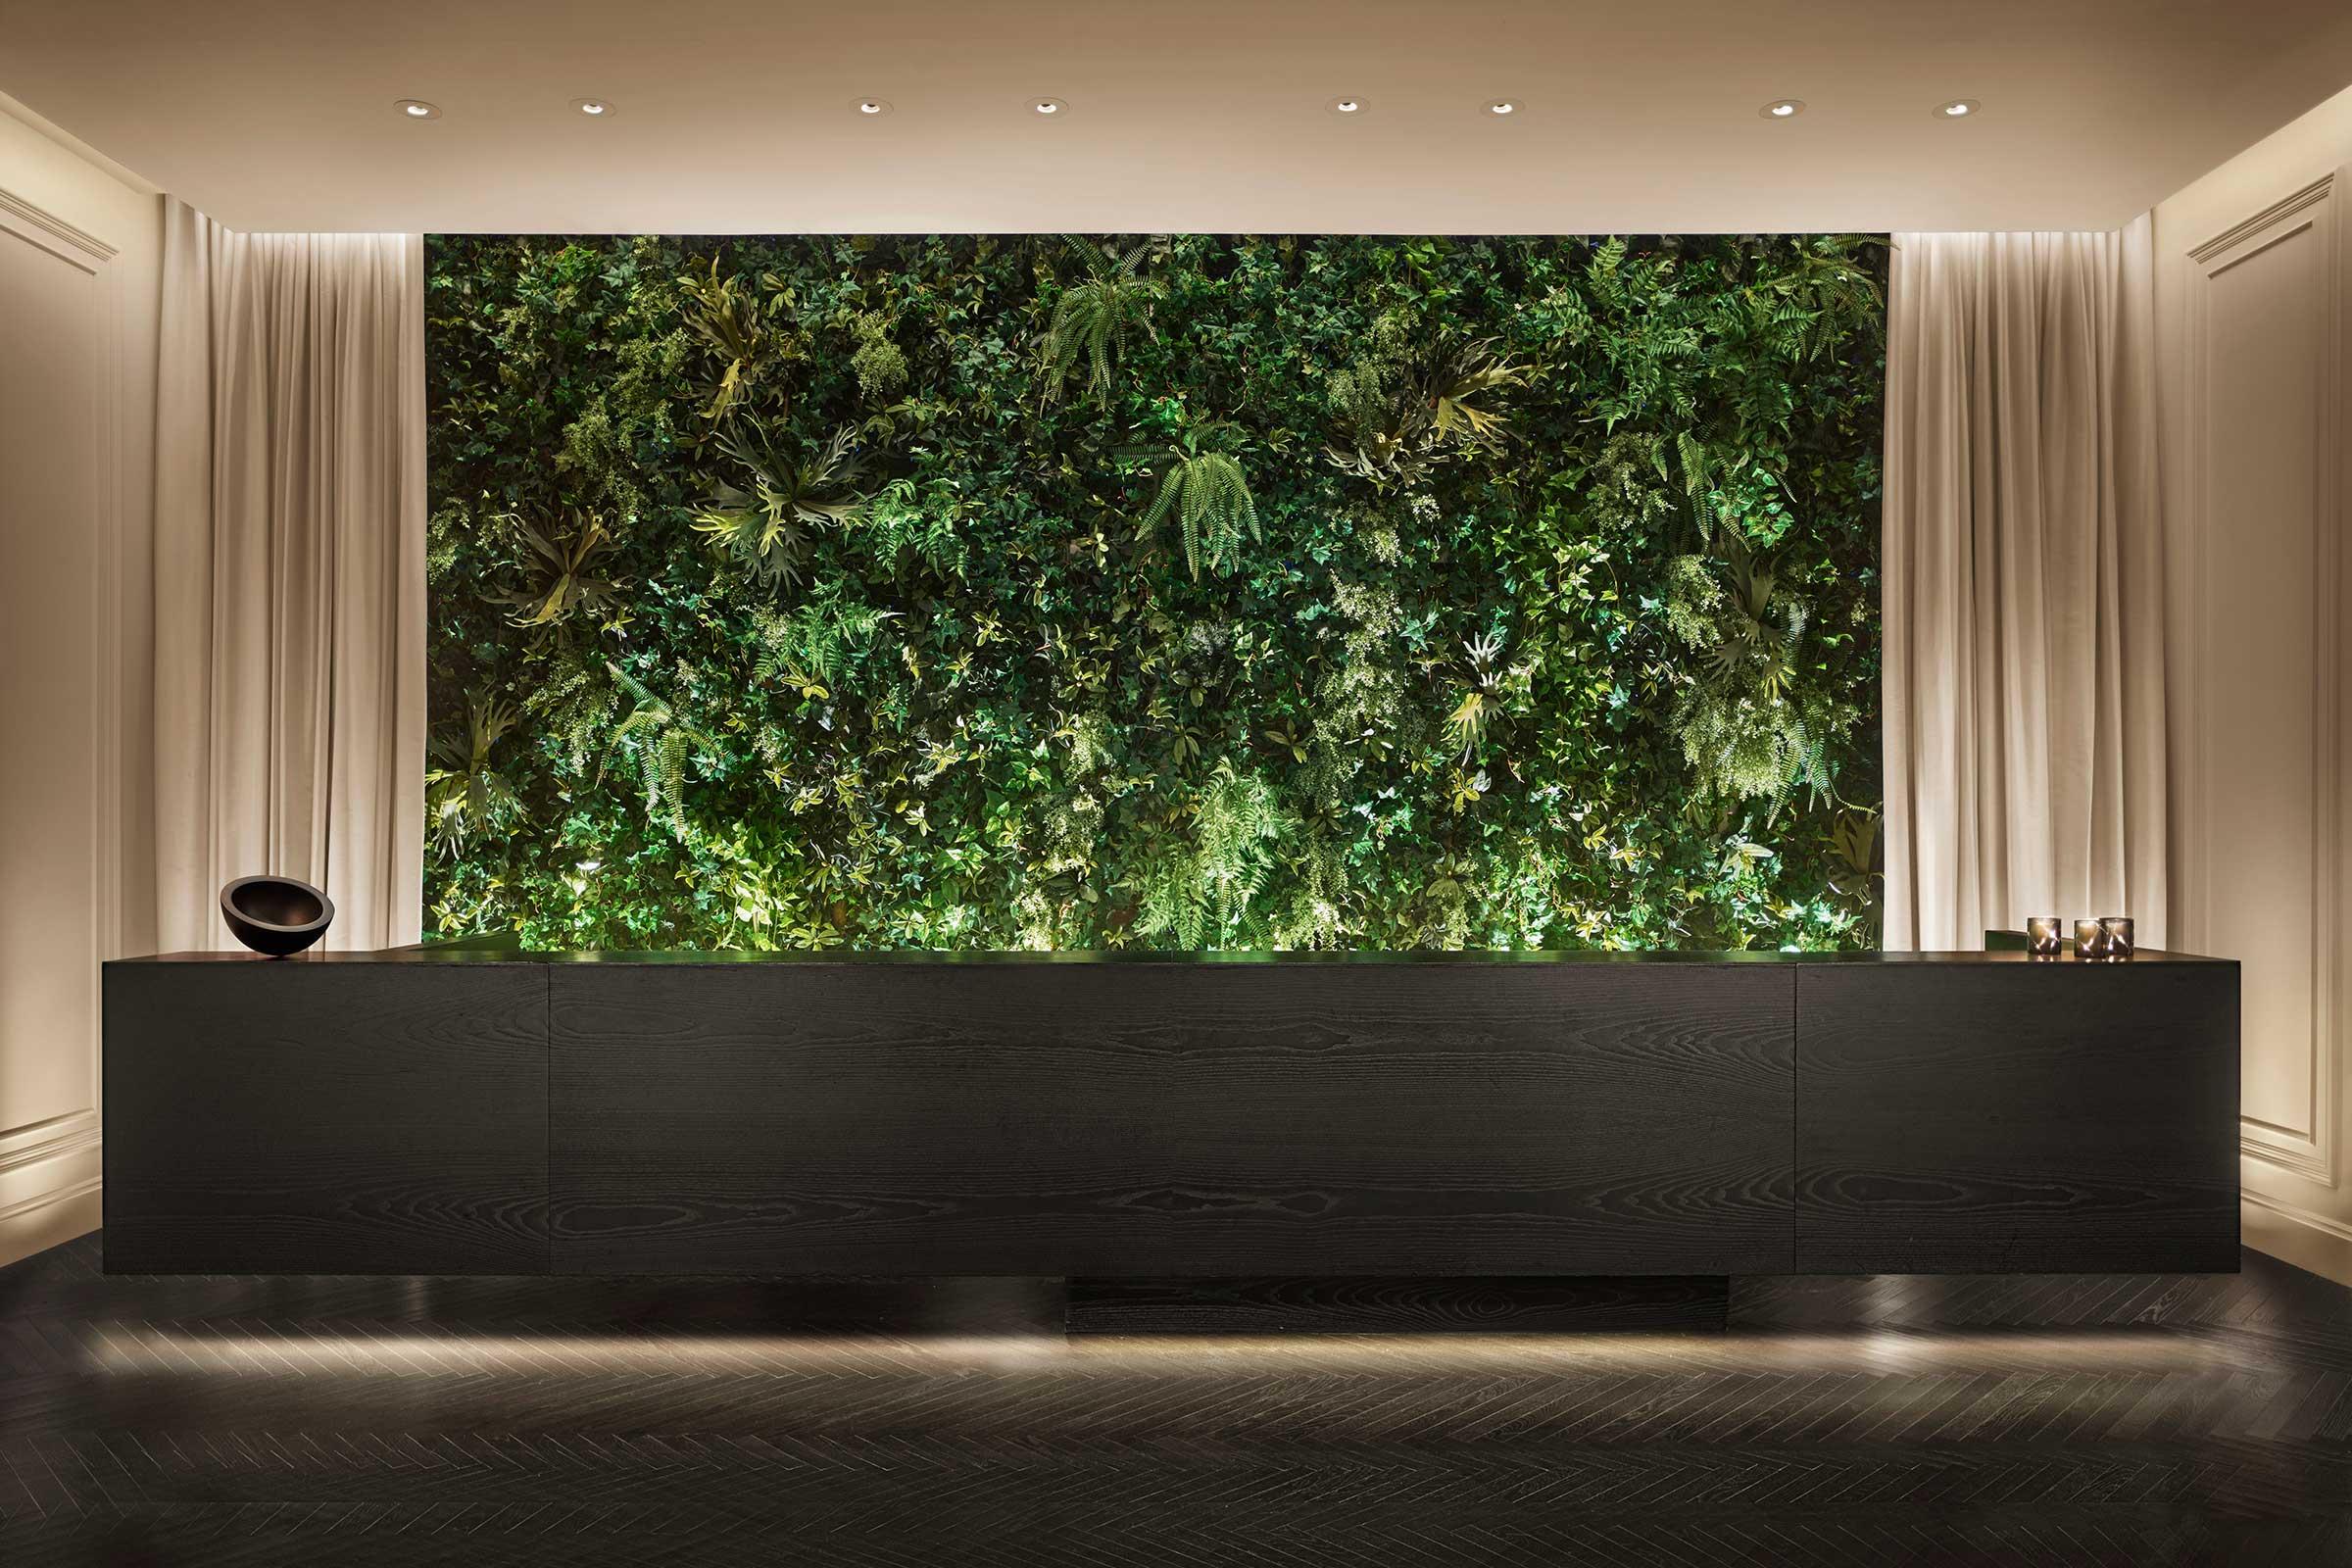 The-Times-Square-EDITION_Lobby-Reception-Desk_-Credit-Nicolas-Koenig.jpg